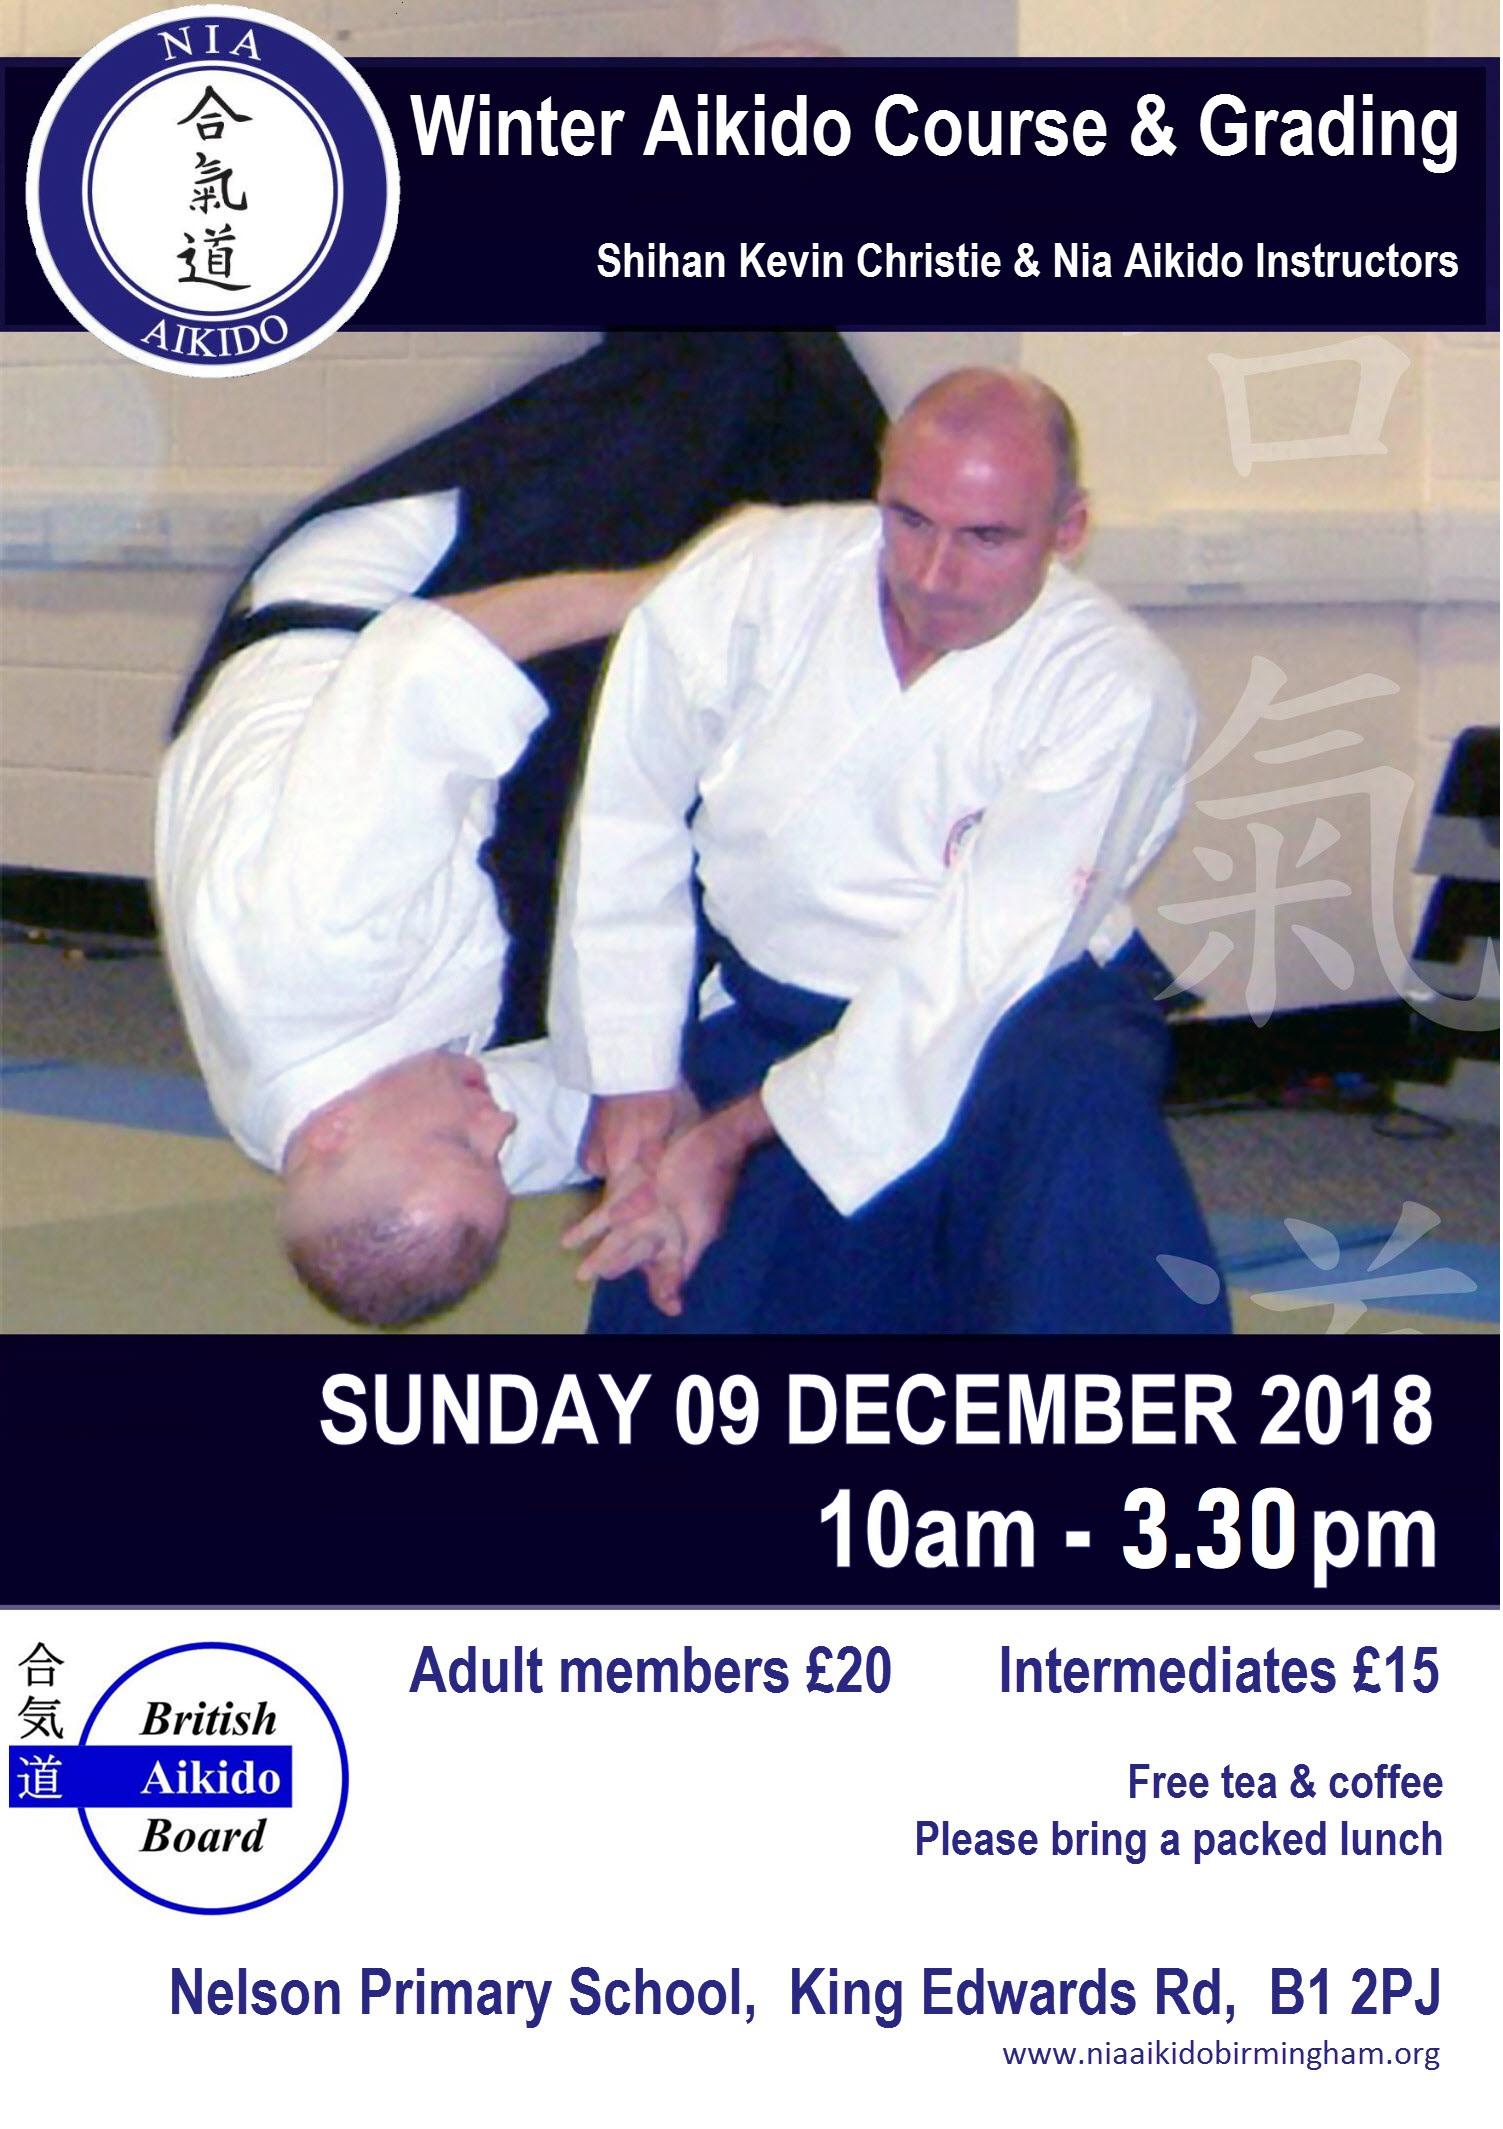 NIA Aikido Winter Course 2018 Grading